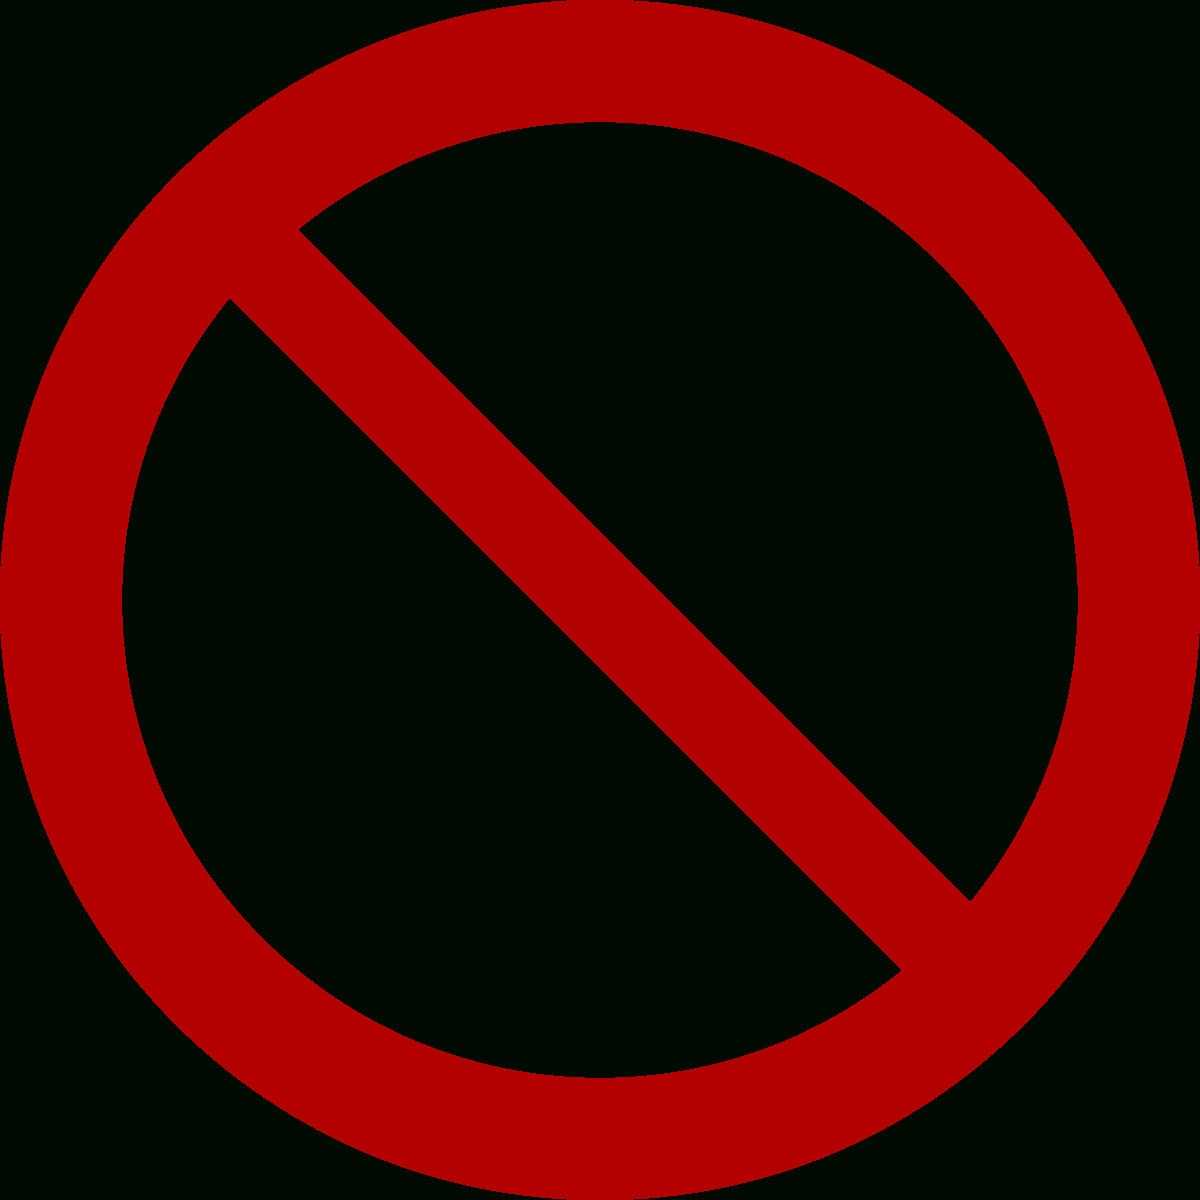 No Symbol - Wikipedia - Free Printable No Entry Sign